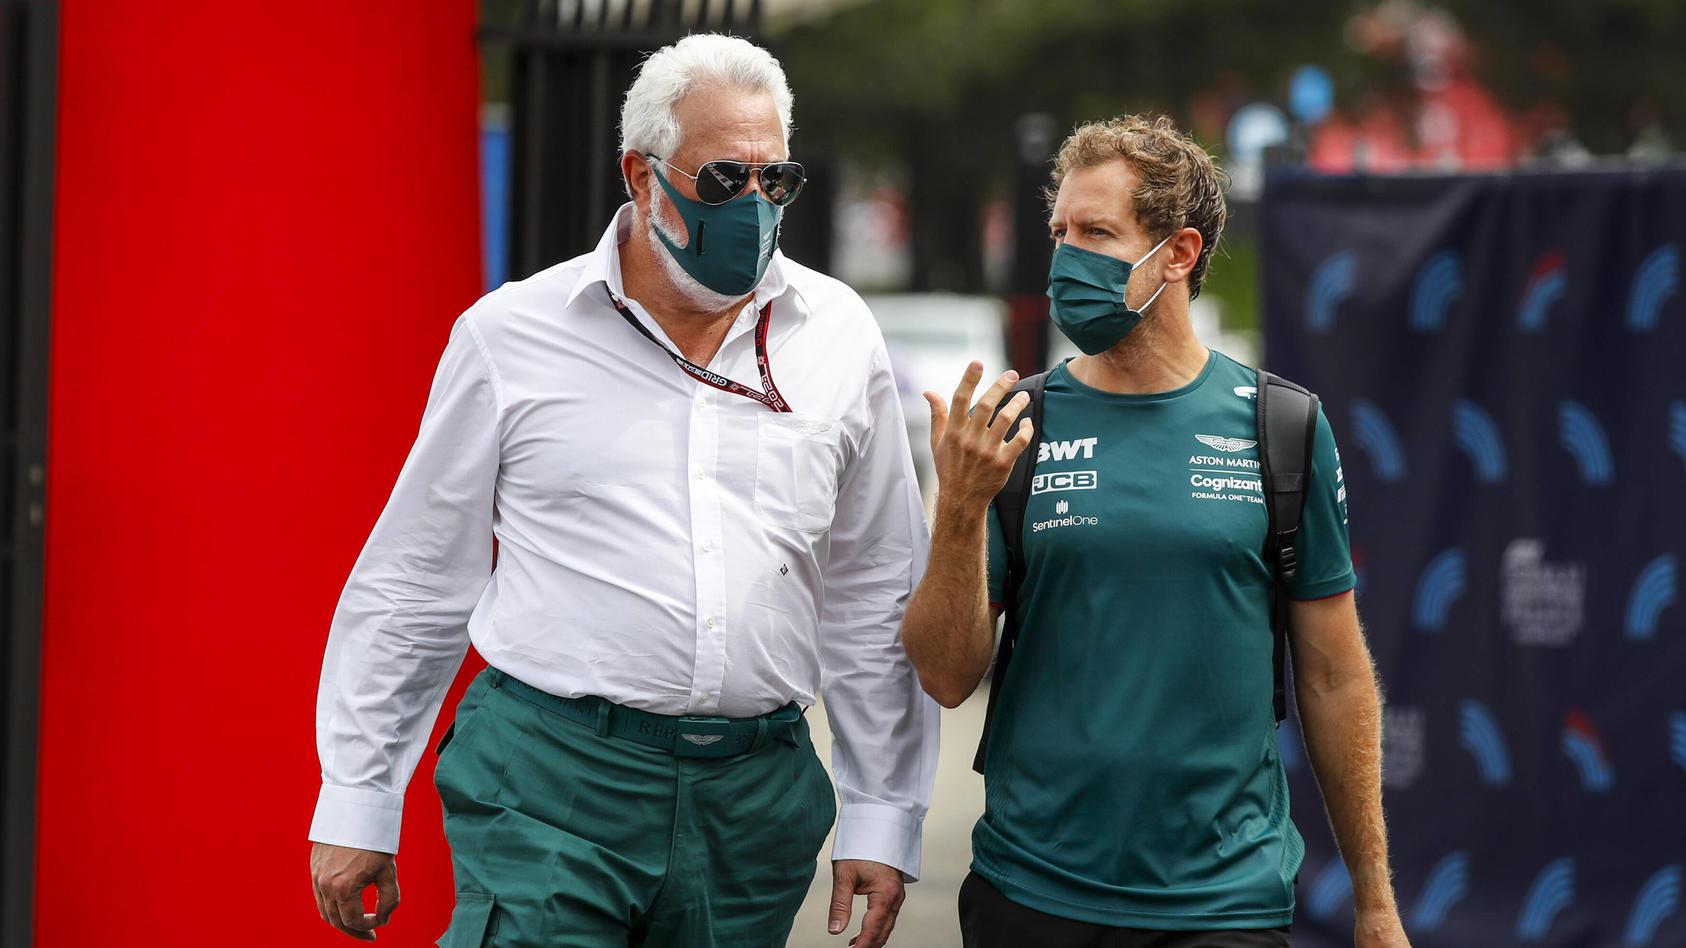 Lawrence Stroll will Aston Martin zum Weltmeister-Team machen - mit Sebastian Vettel?